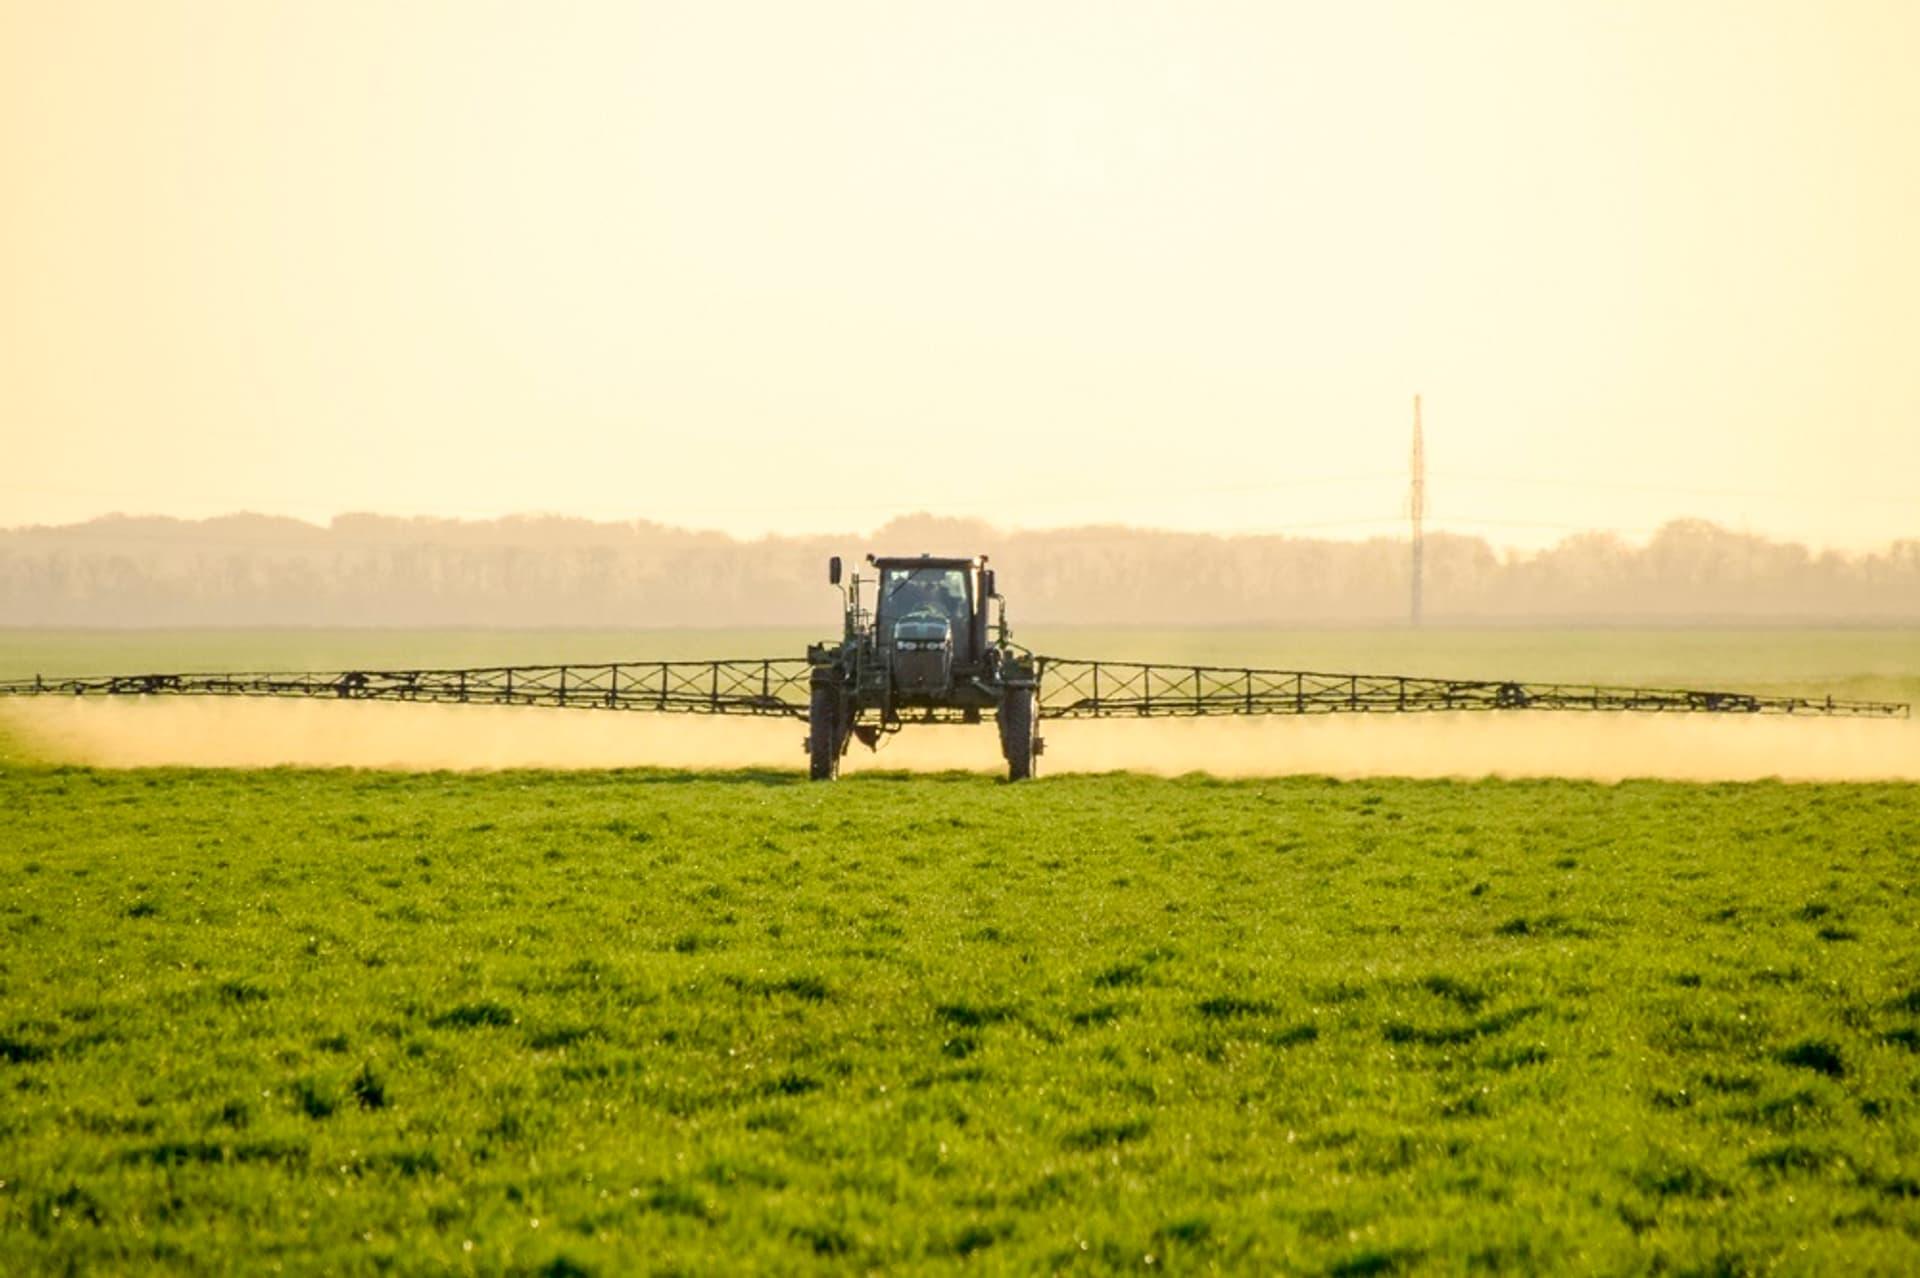 Traktor Feld Glyphosat c i Stock Leonid Eremeychuk 865073856